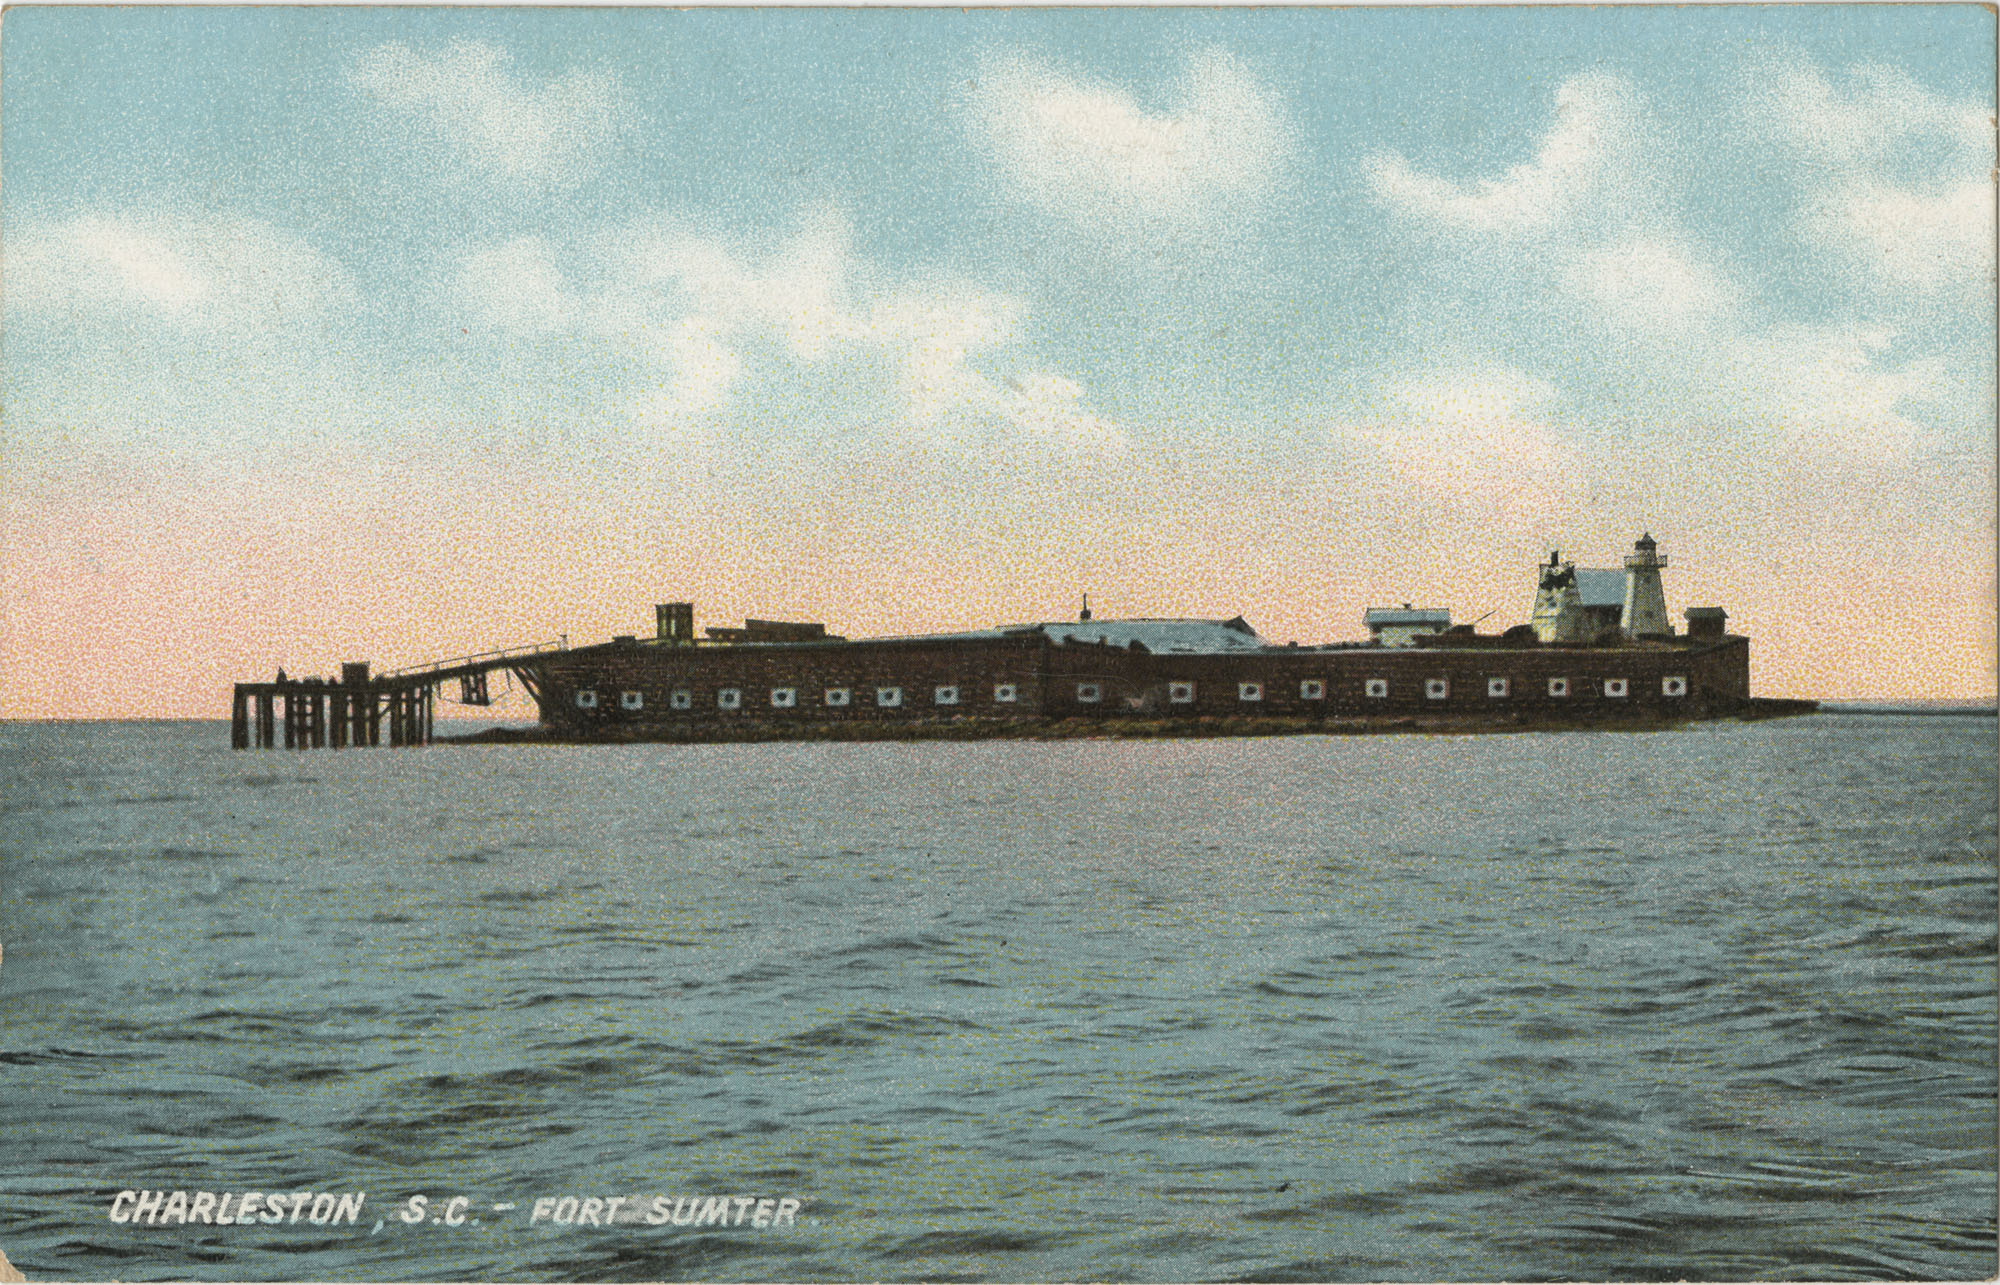 Charleston, S.C. Fort Sumter